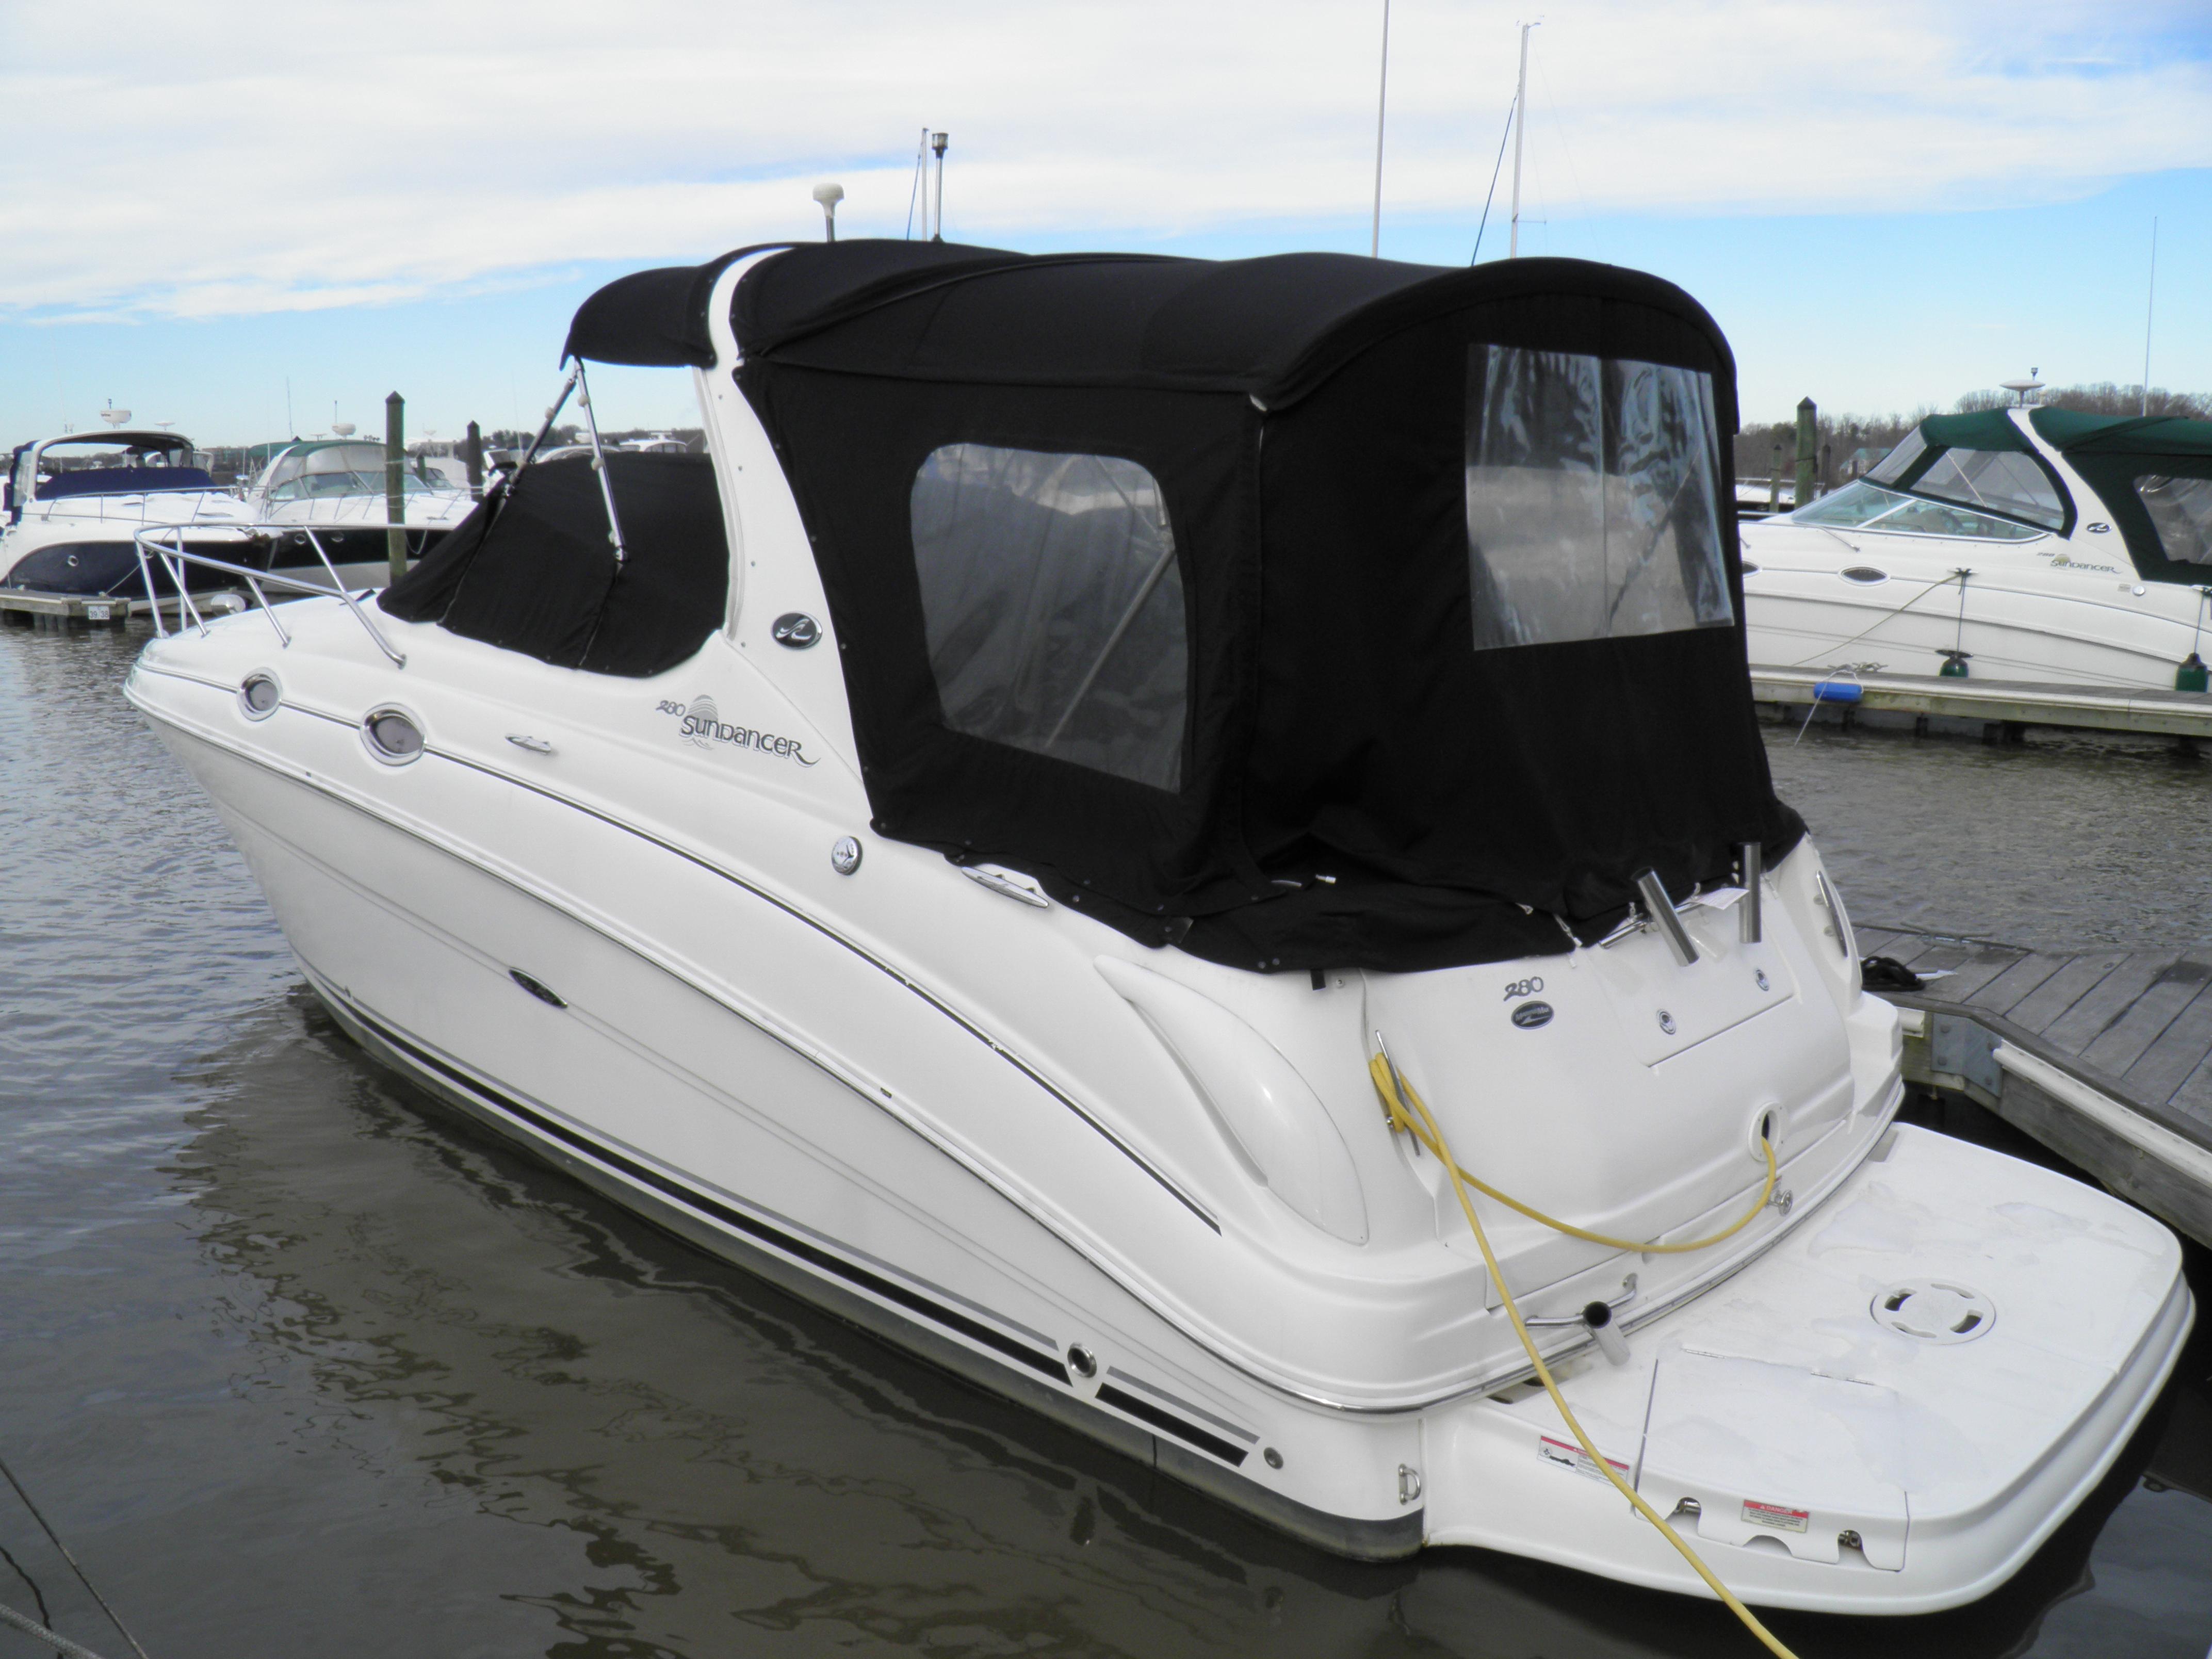 2007 Sea Ray 280 Sundancer, Woodbridge United States - boats com